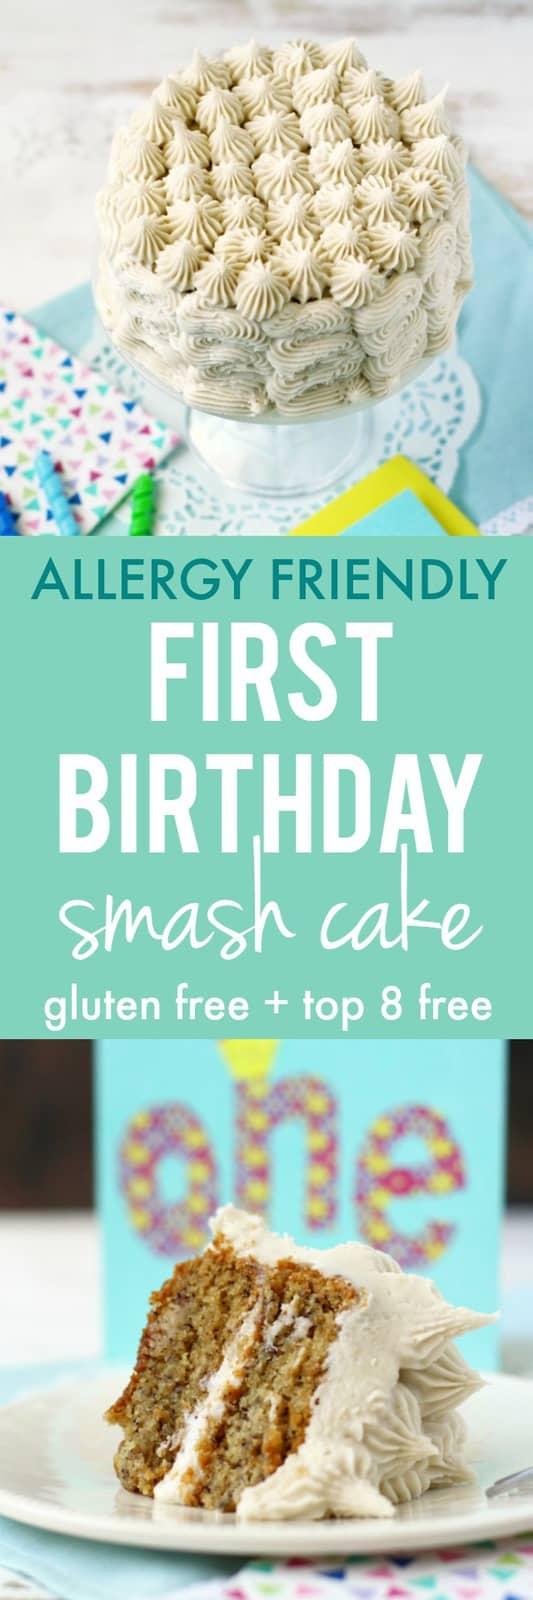 Awesome First Birthday Smash Cake Gluten Free Allergy Friendly The Funny Birthday Cards Online Alyptdamsfinfo